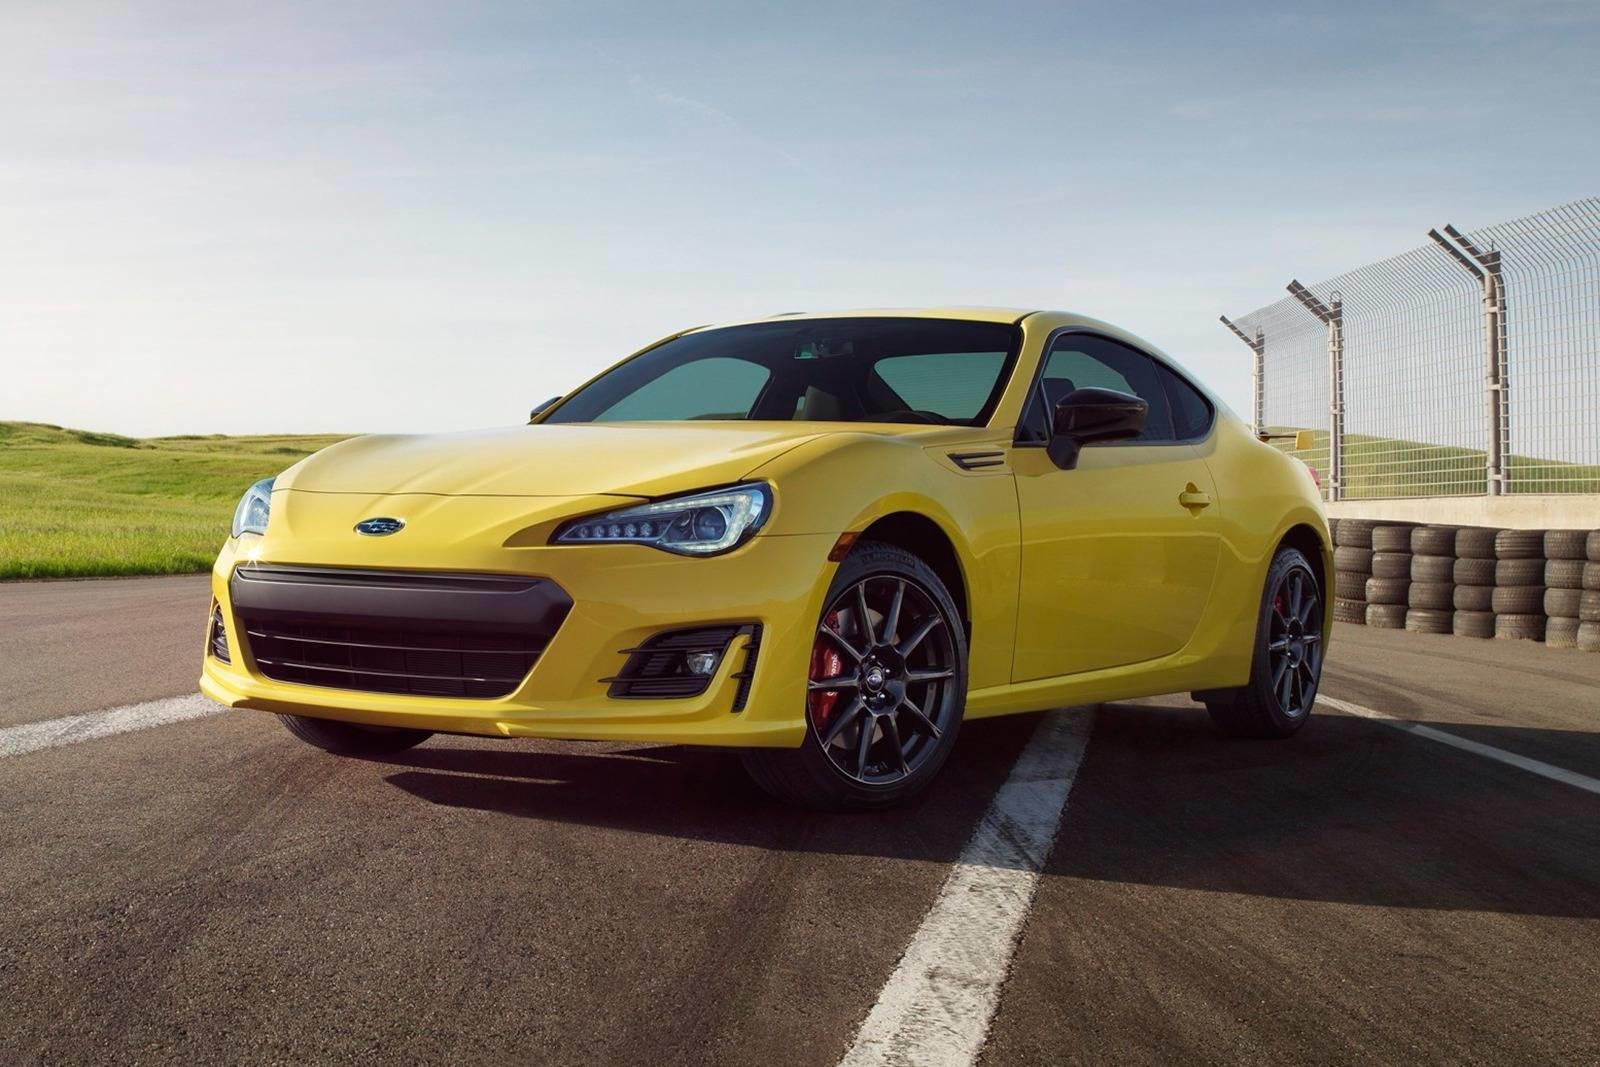 2020 Subaru BRZ: Review, Trims, Specs, Price, New Interior ...